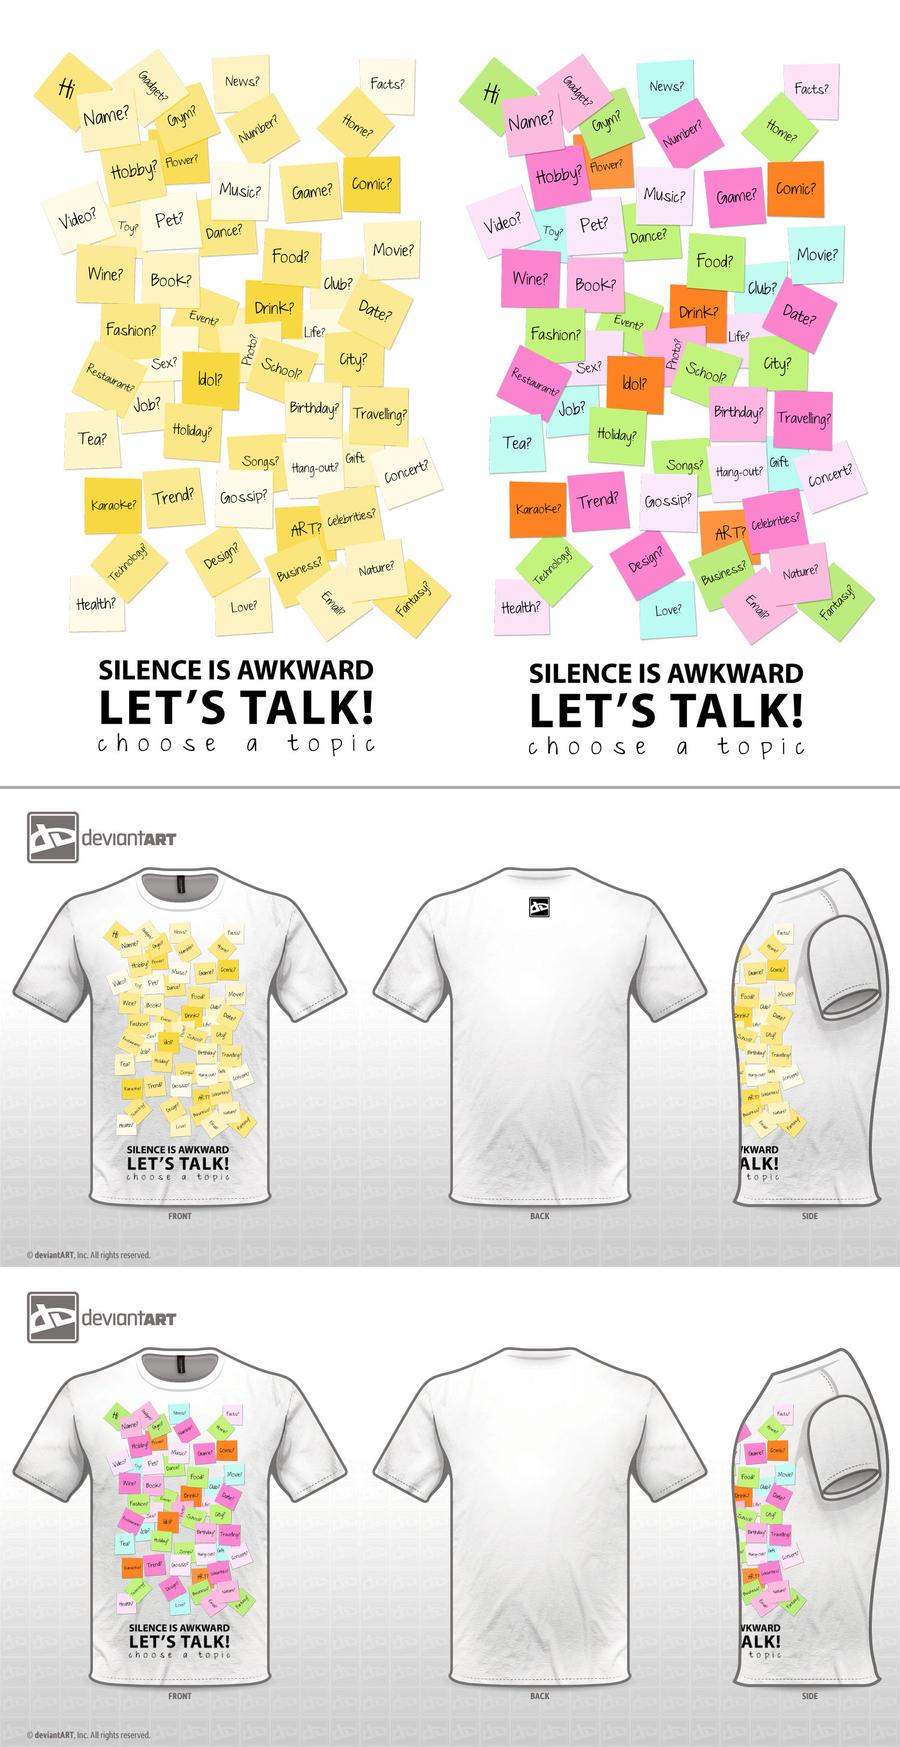 SILENCE IS AWKWARD, LET'S TALK by Thunderdee